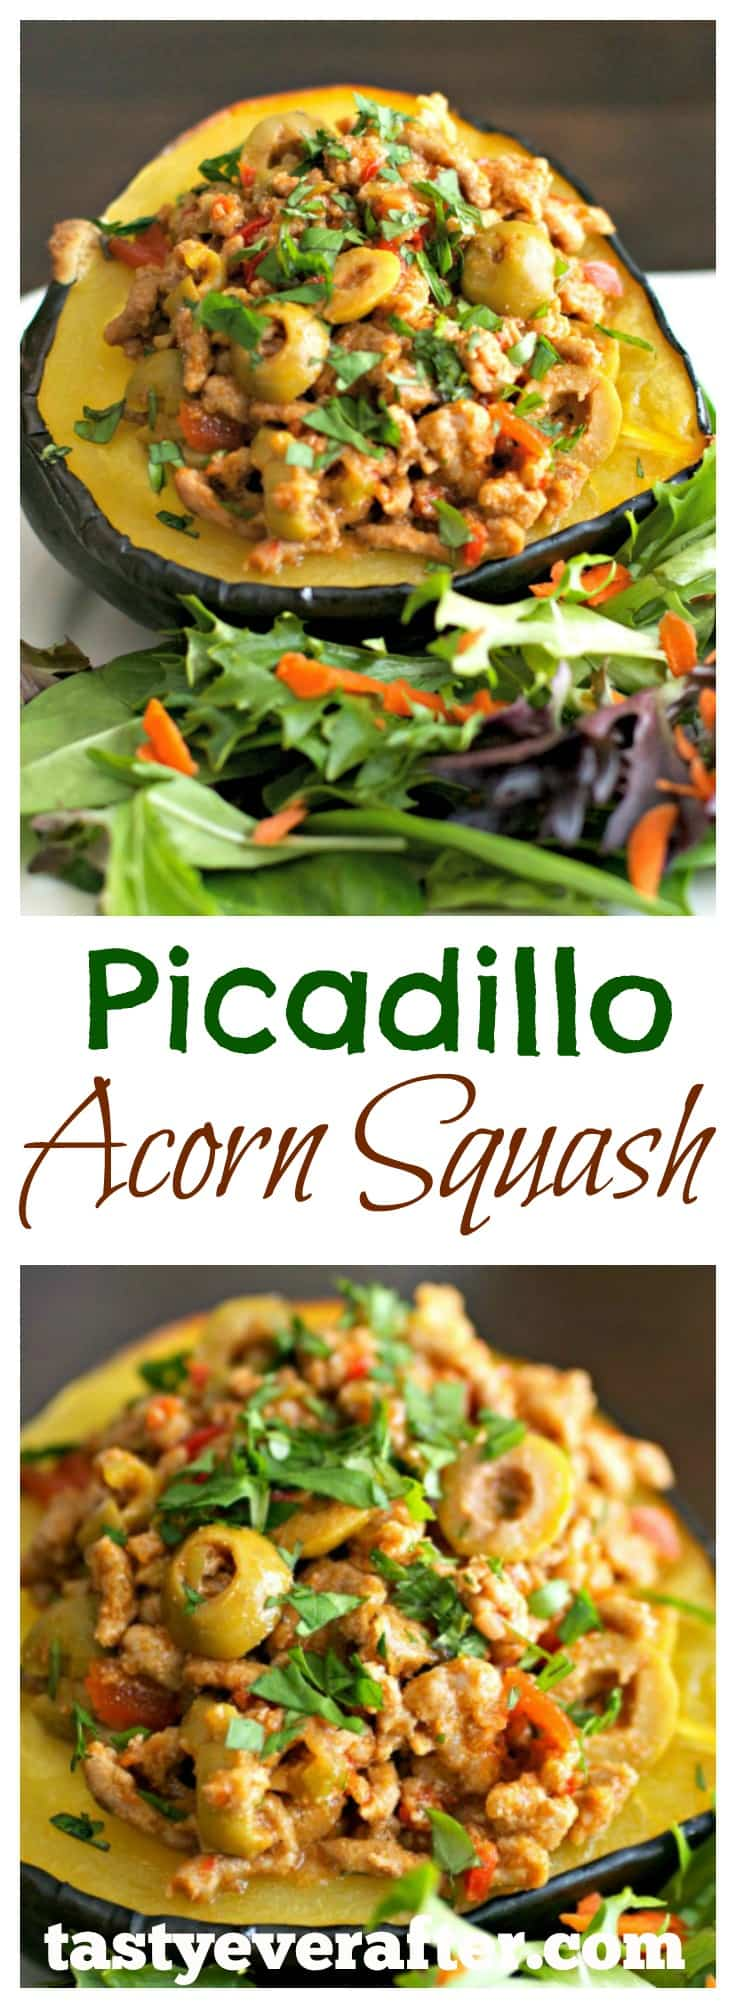 picadillo stuffed acorn squash